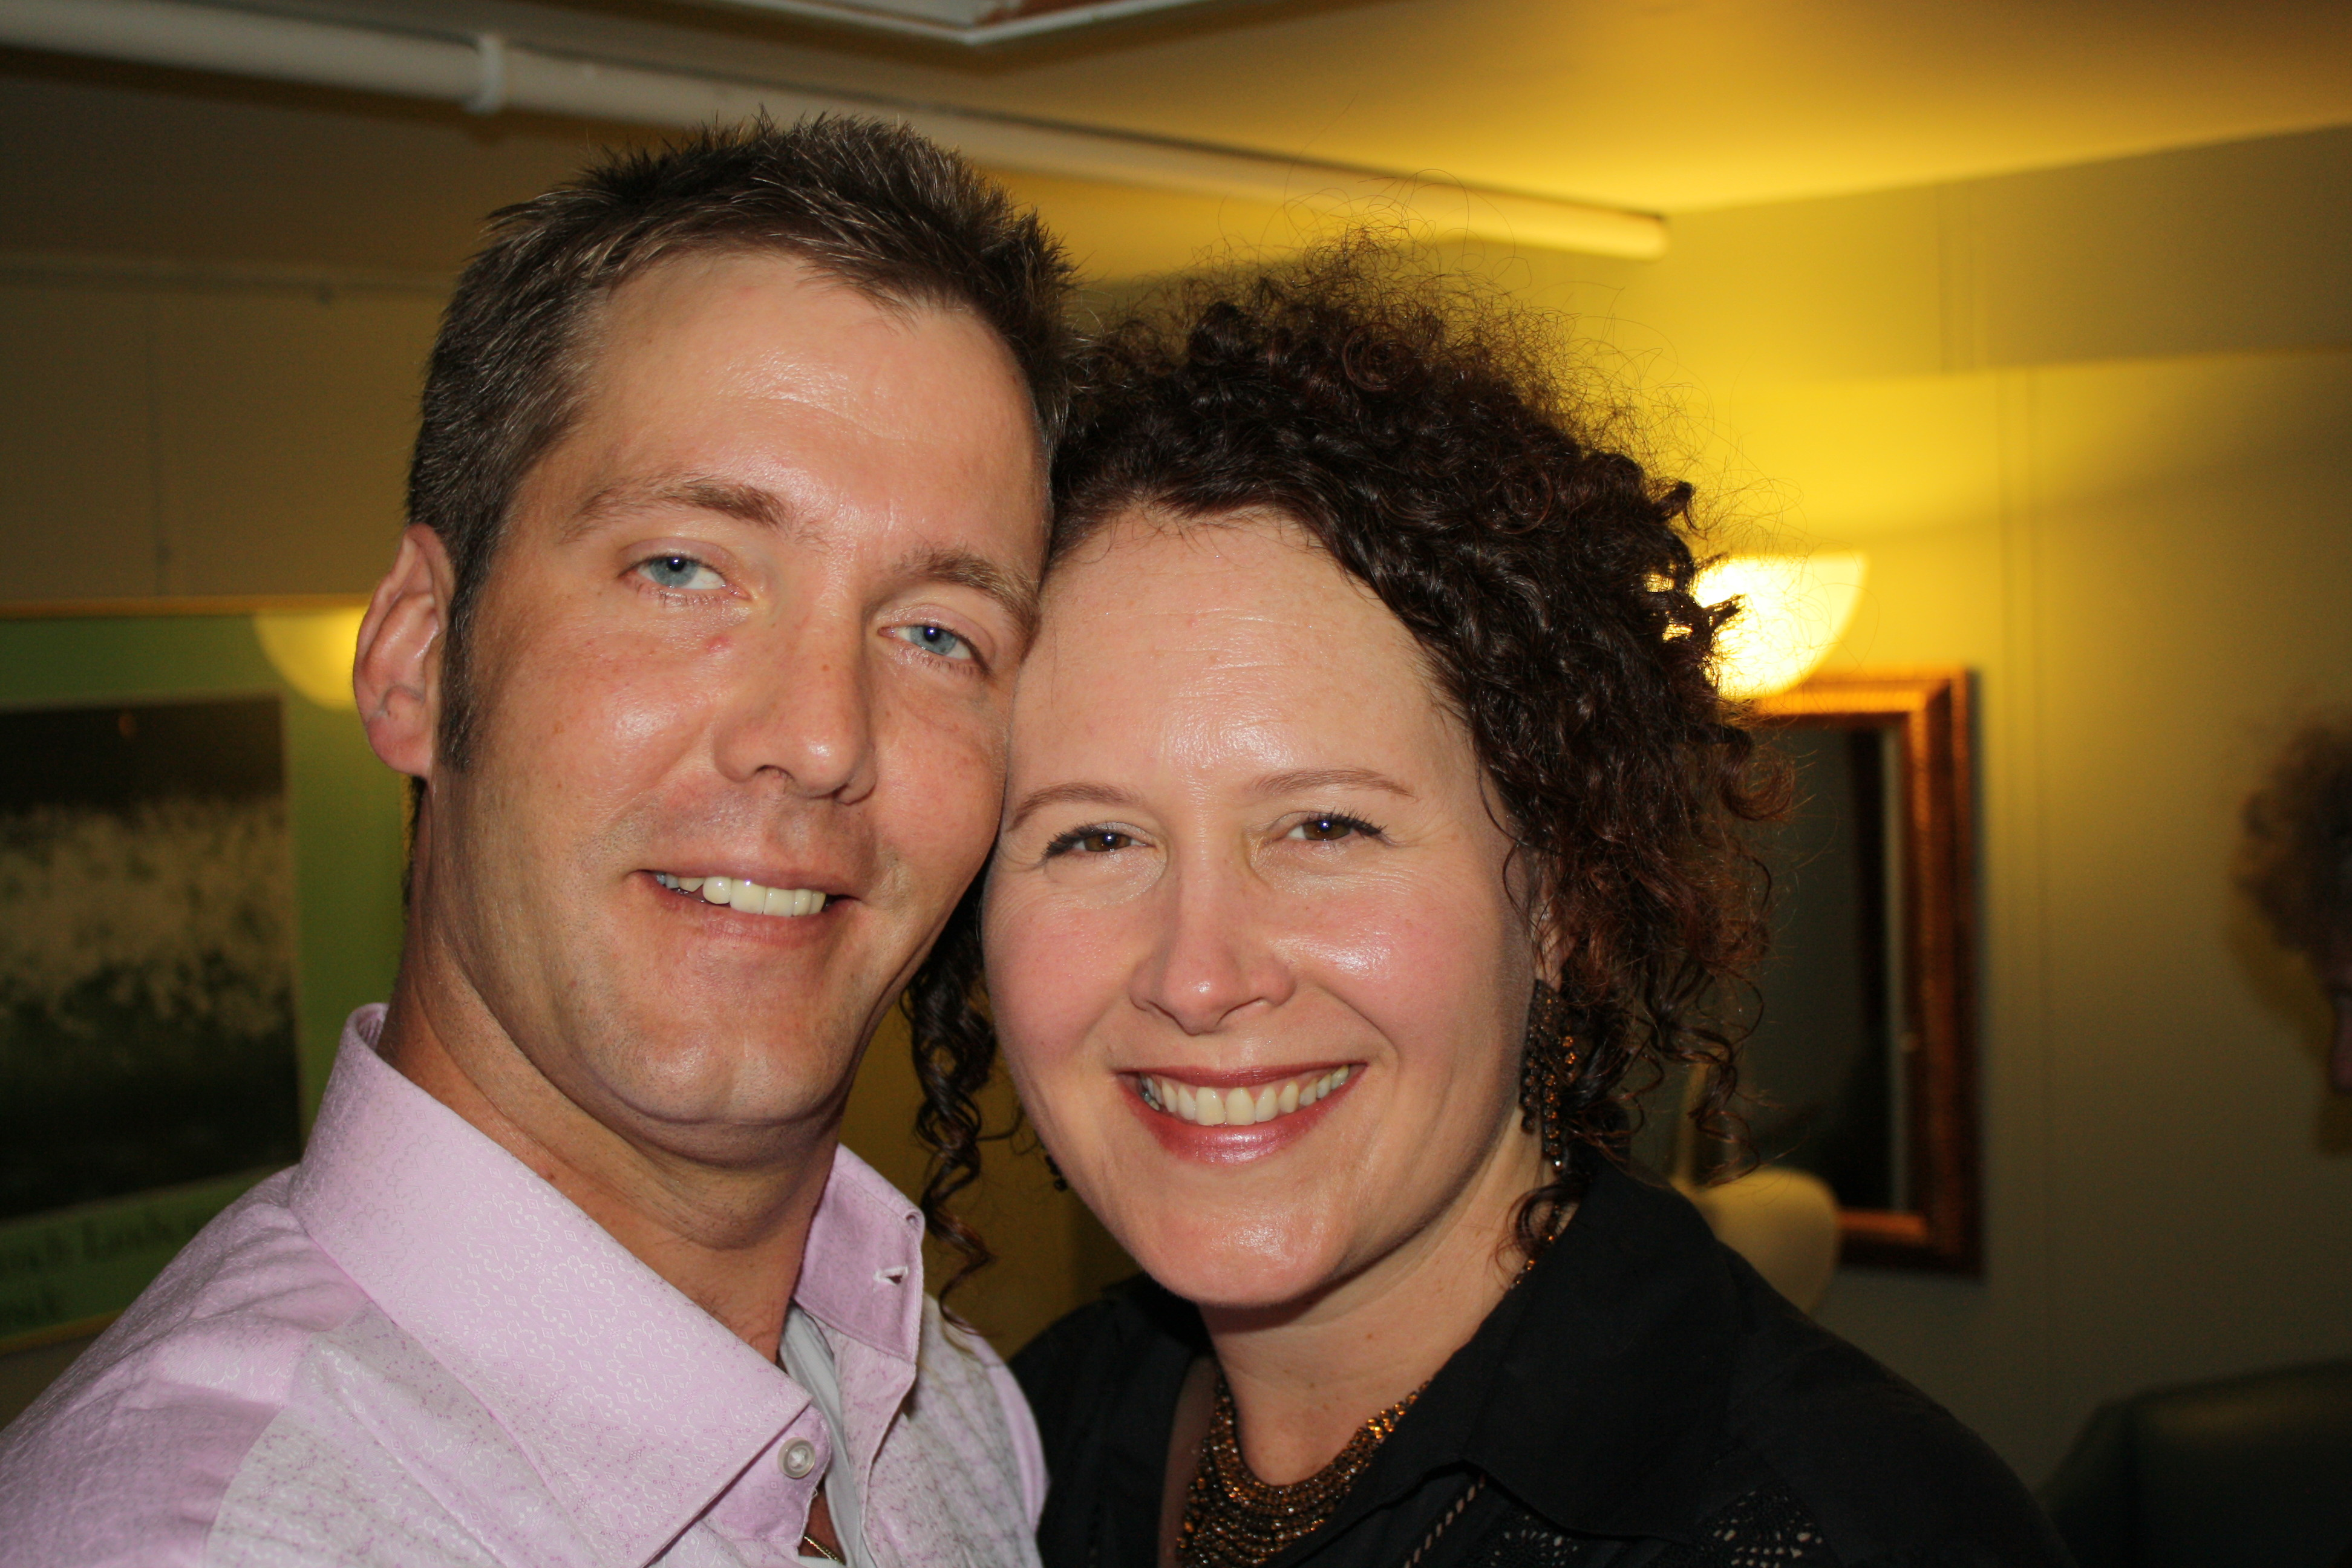 Larry Steel and Brenda backstage - larrybrenda